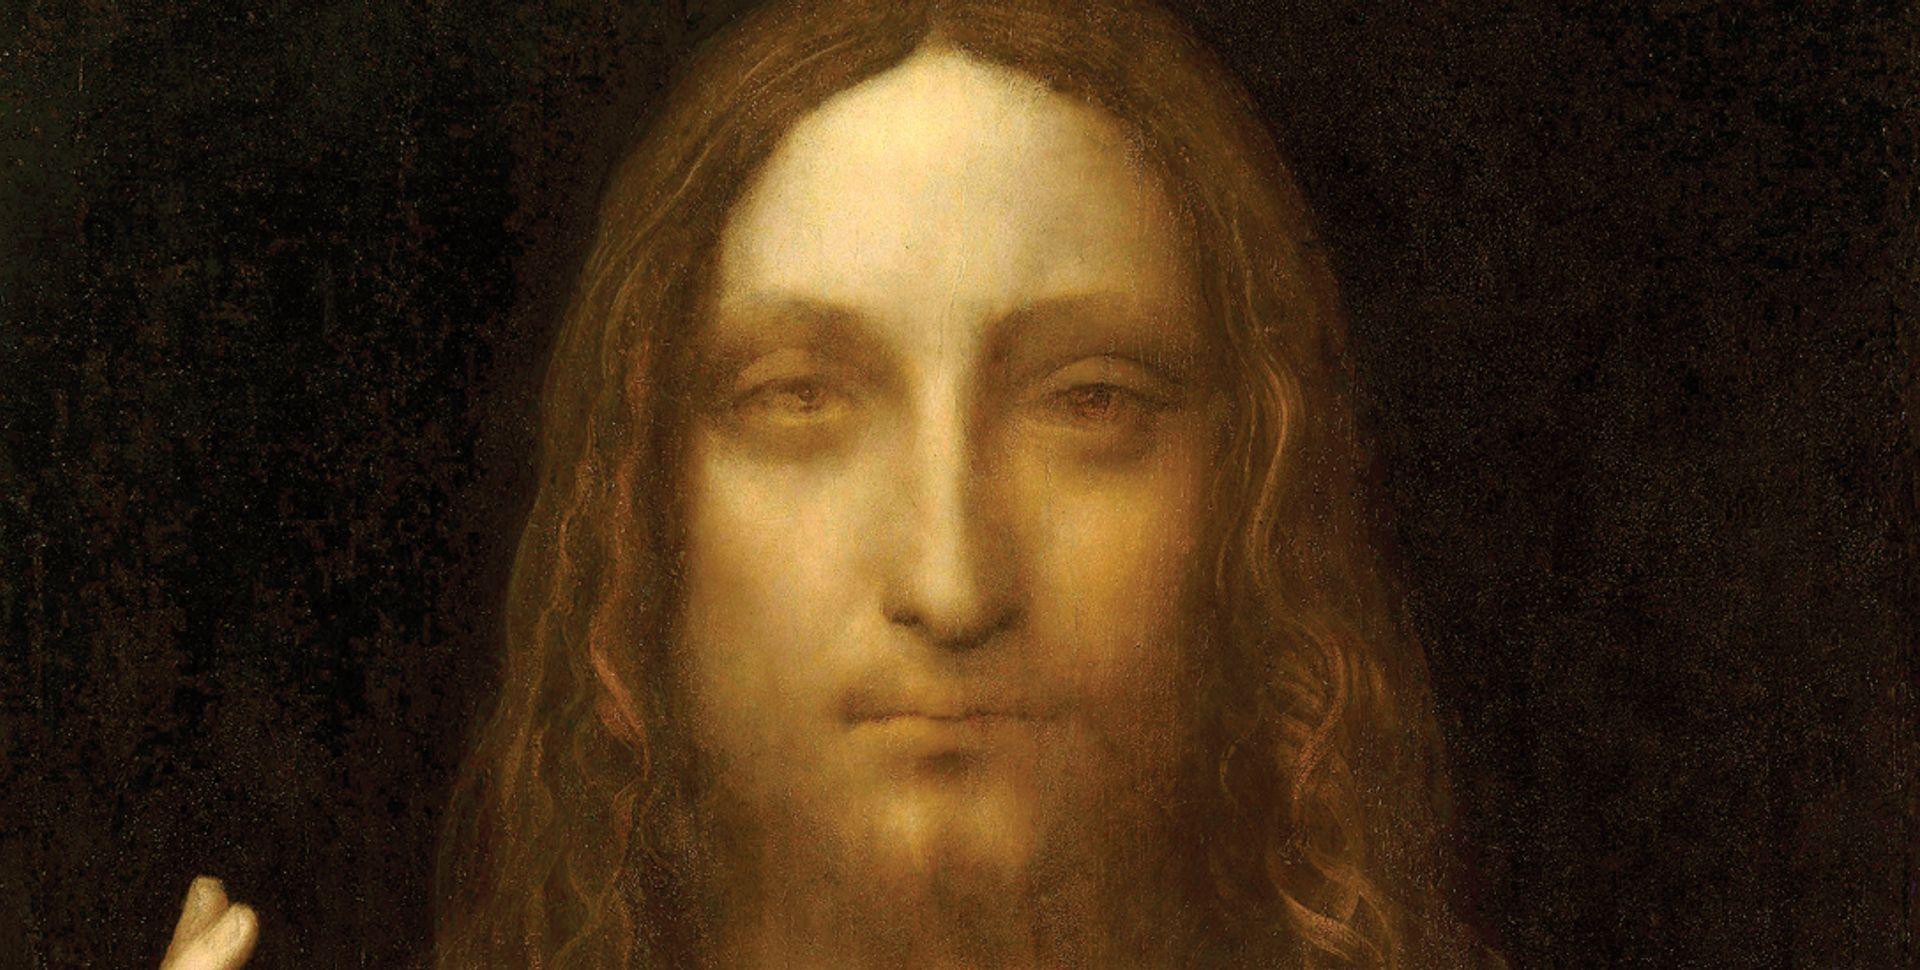 Leonardo da Vinci: Salvator Mundi (Abu Dhabi version, around 1512) Photo: VCG Wilson/Corbis via Getty Images